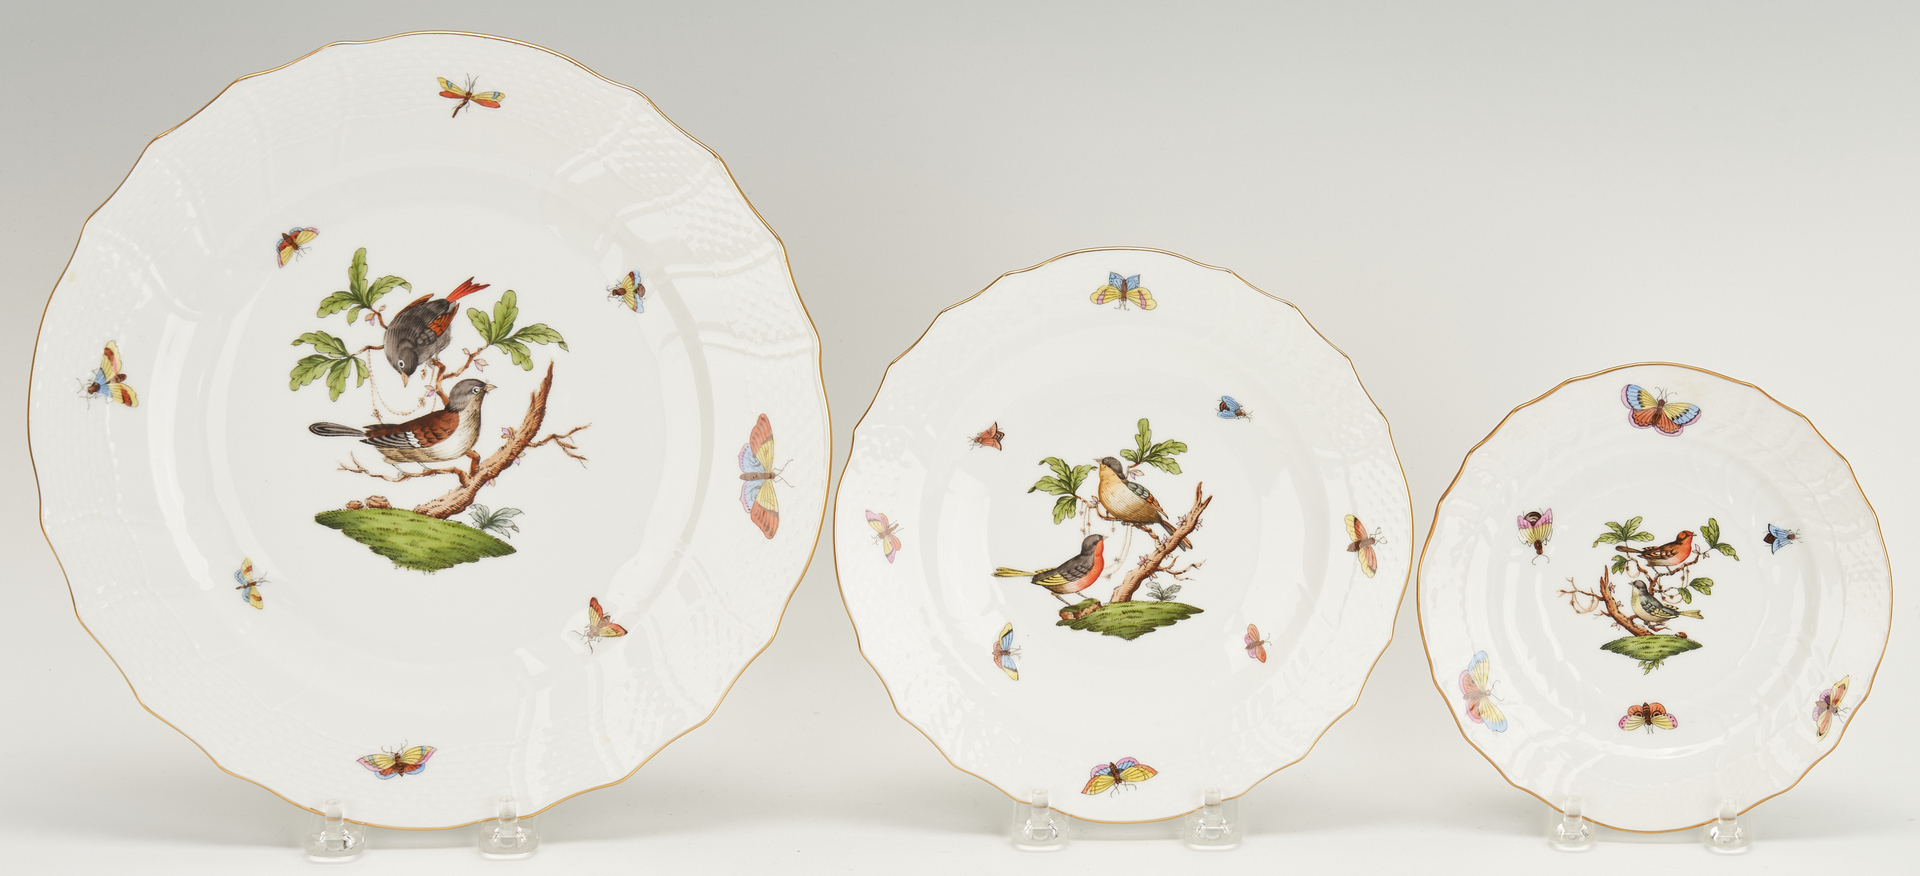 Lot 263: Herend Rothschild Bird China Service, 69 pcs